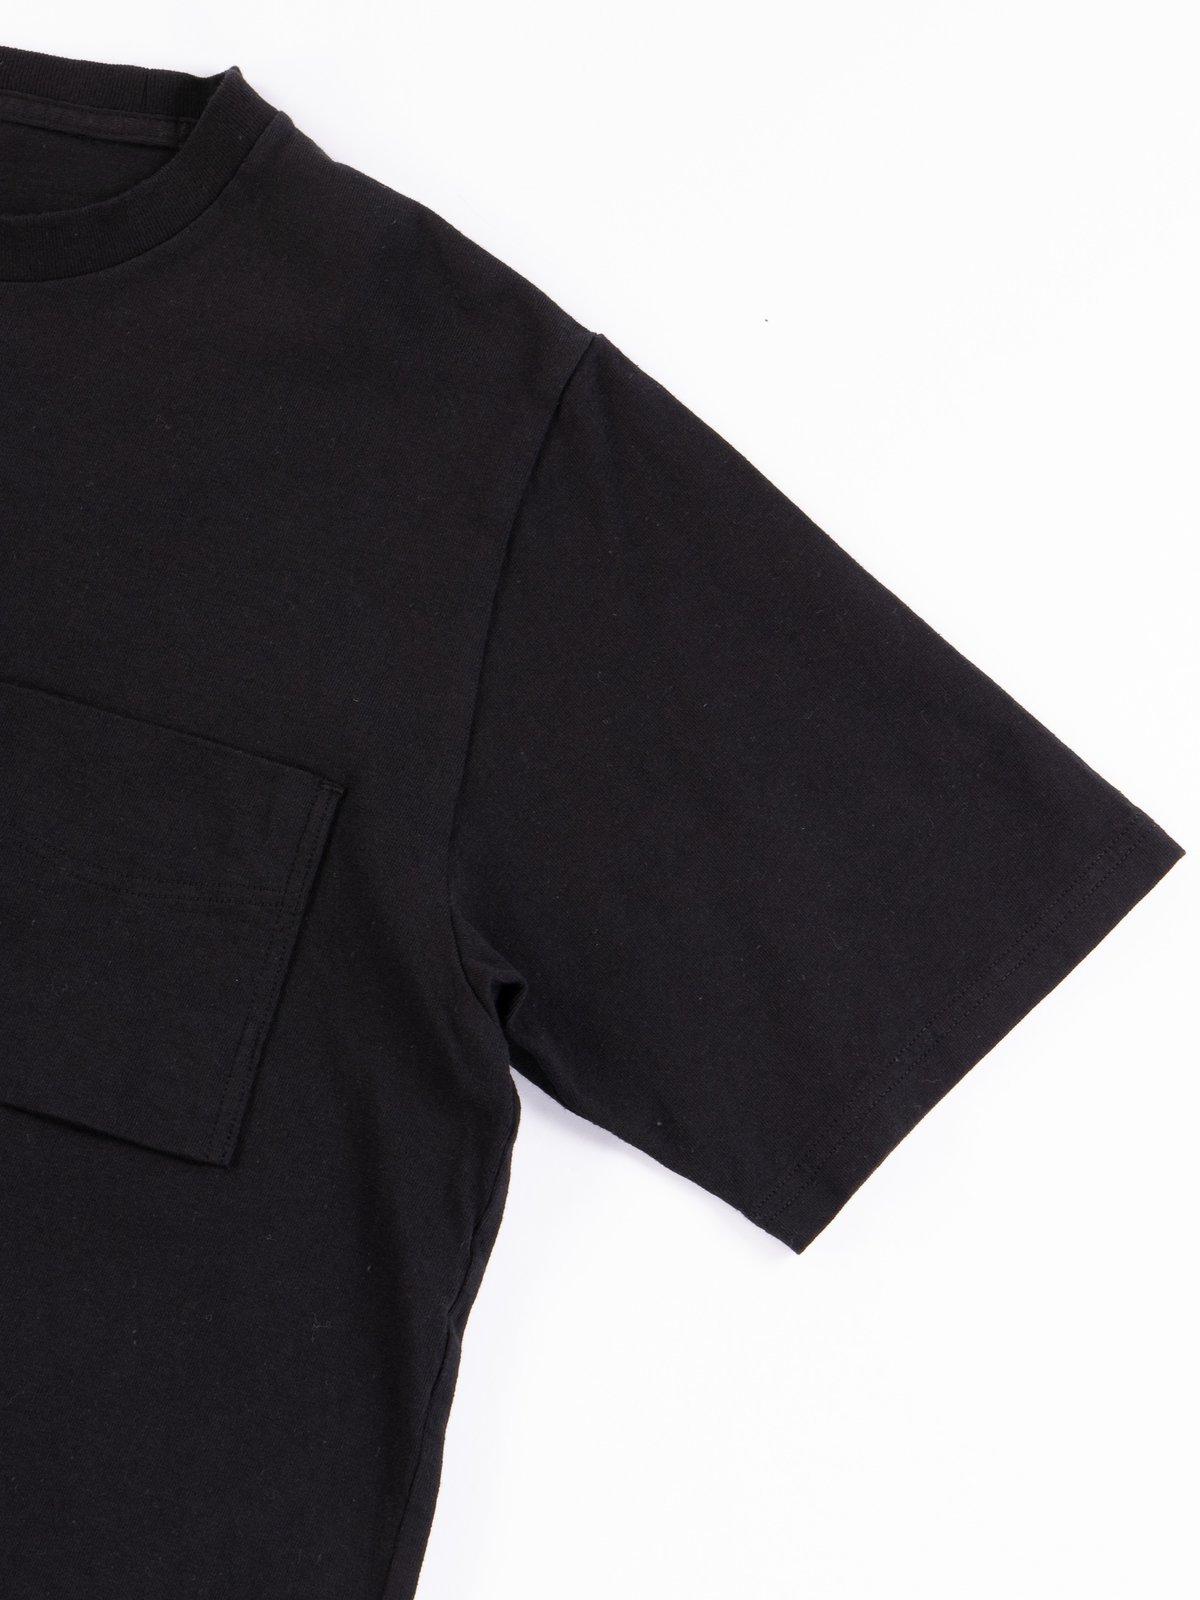 Black Pocket T–Shirt - Image 4